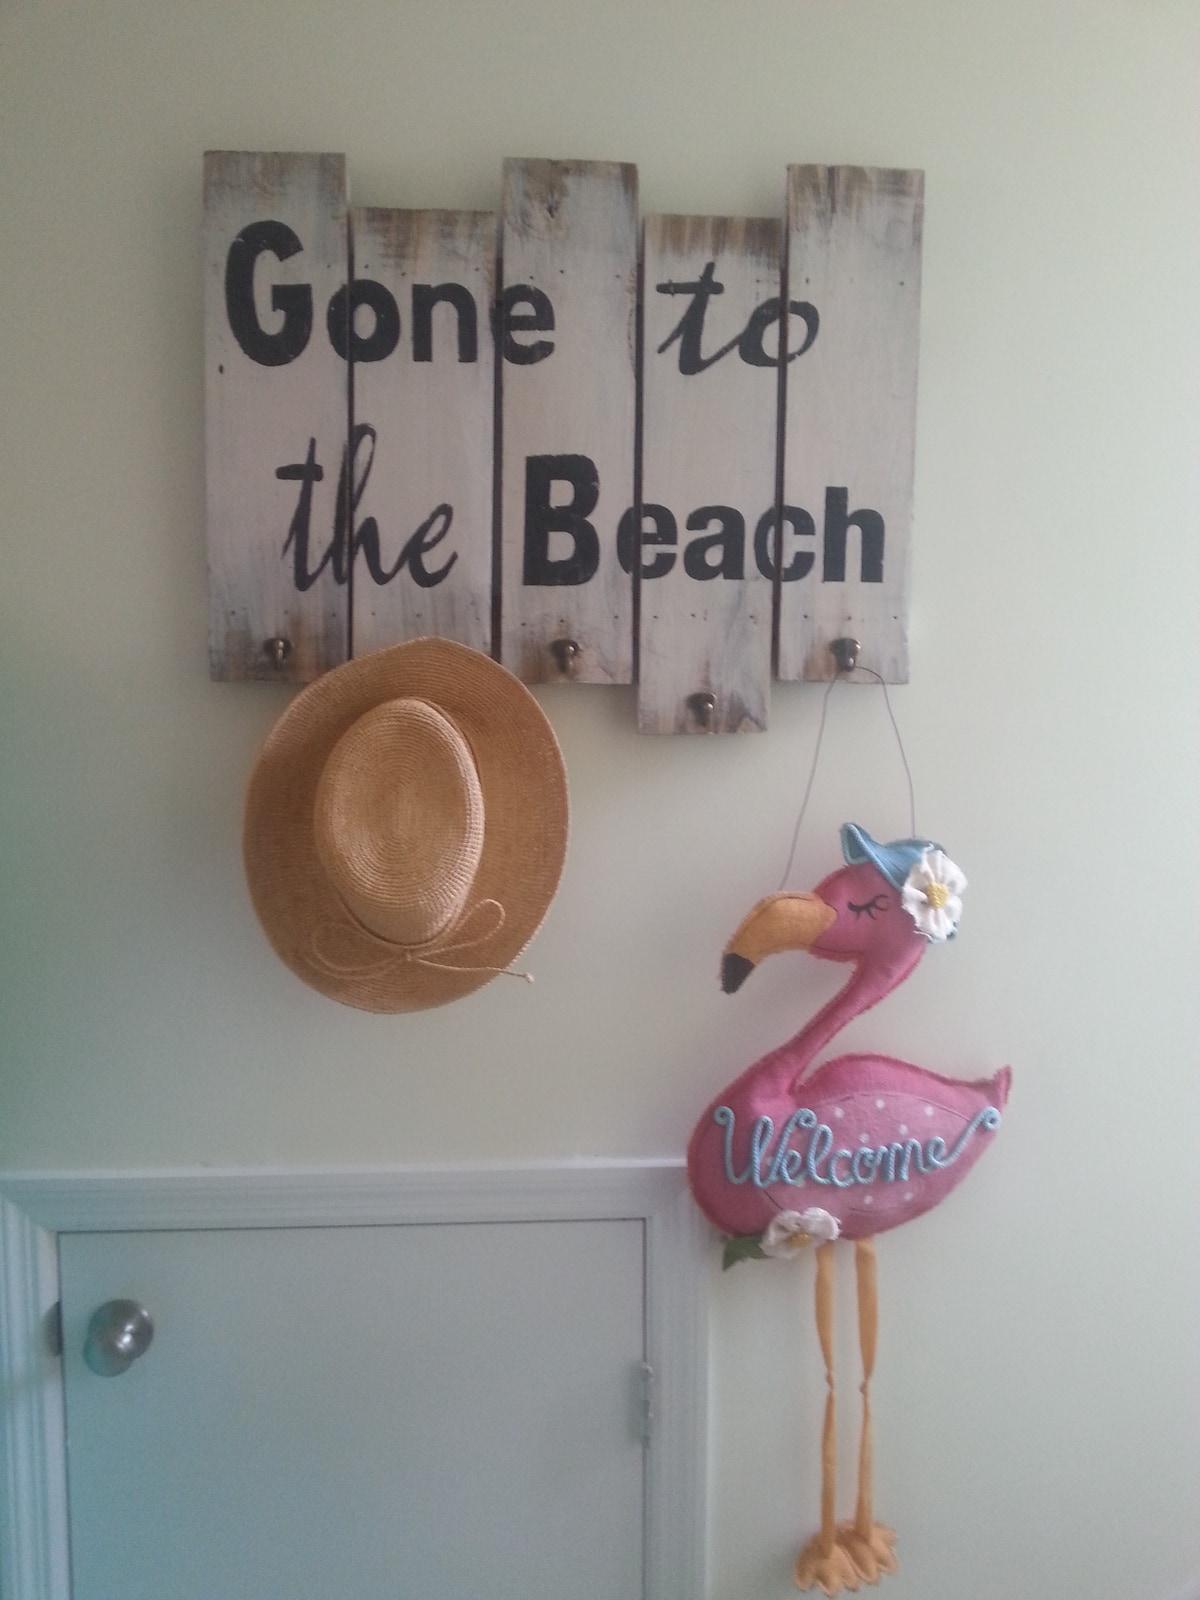 Kathleen from St Augustine Beach